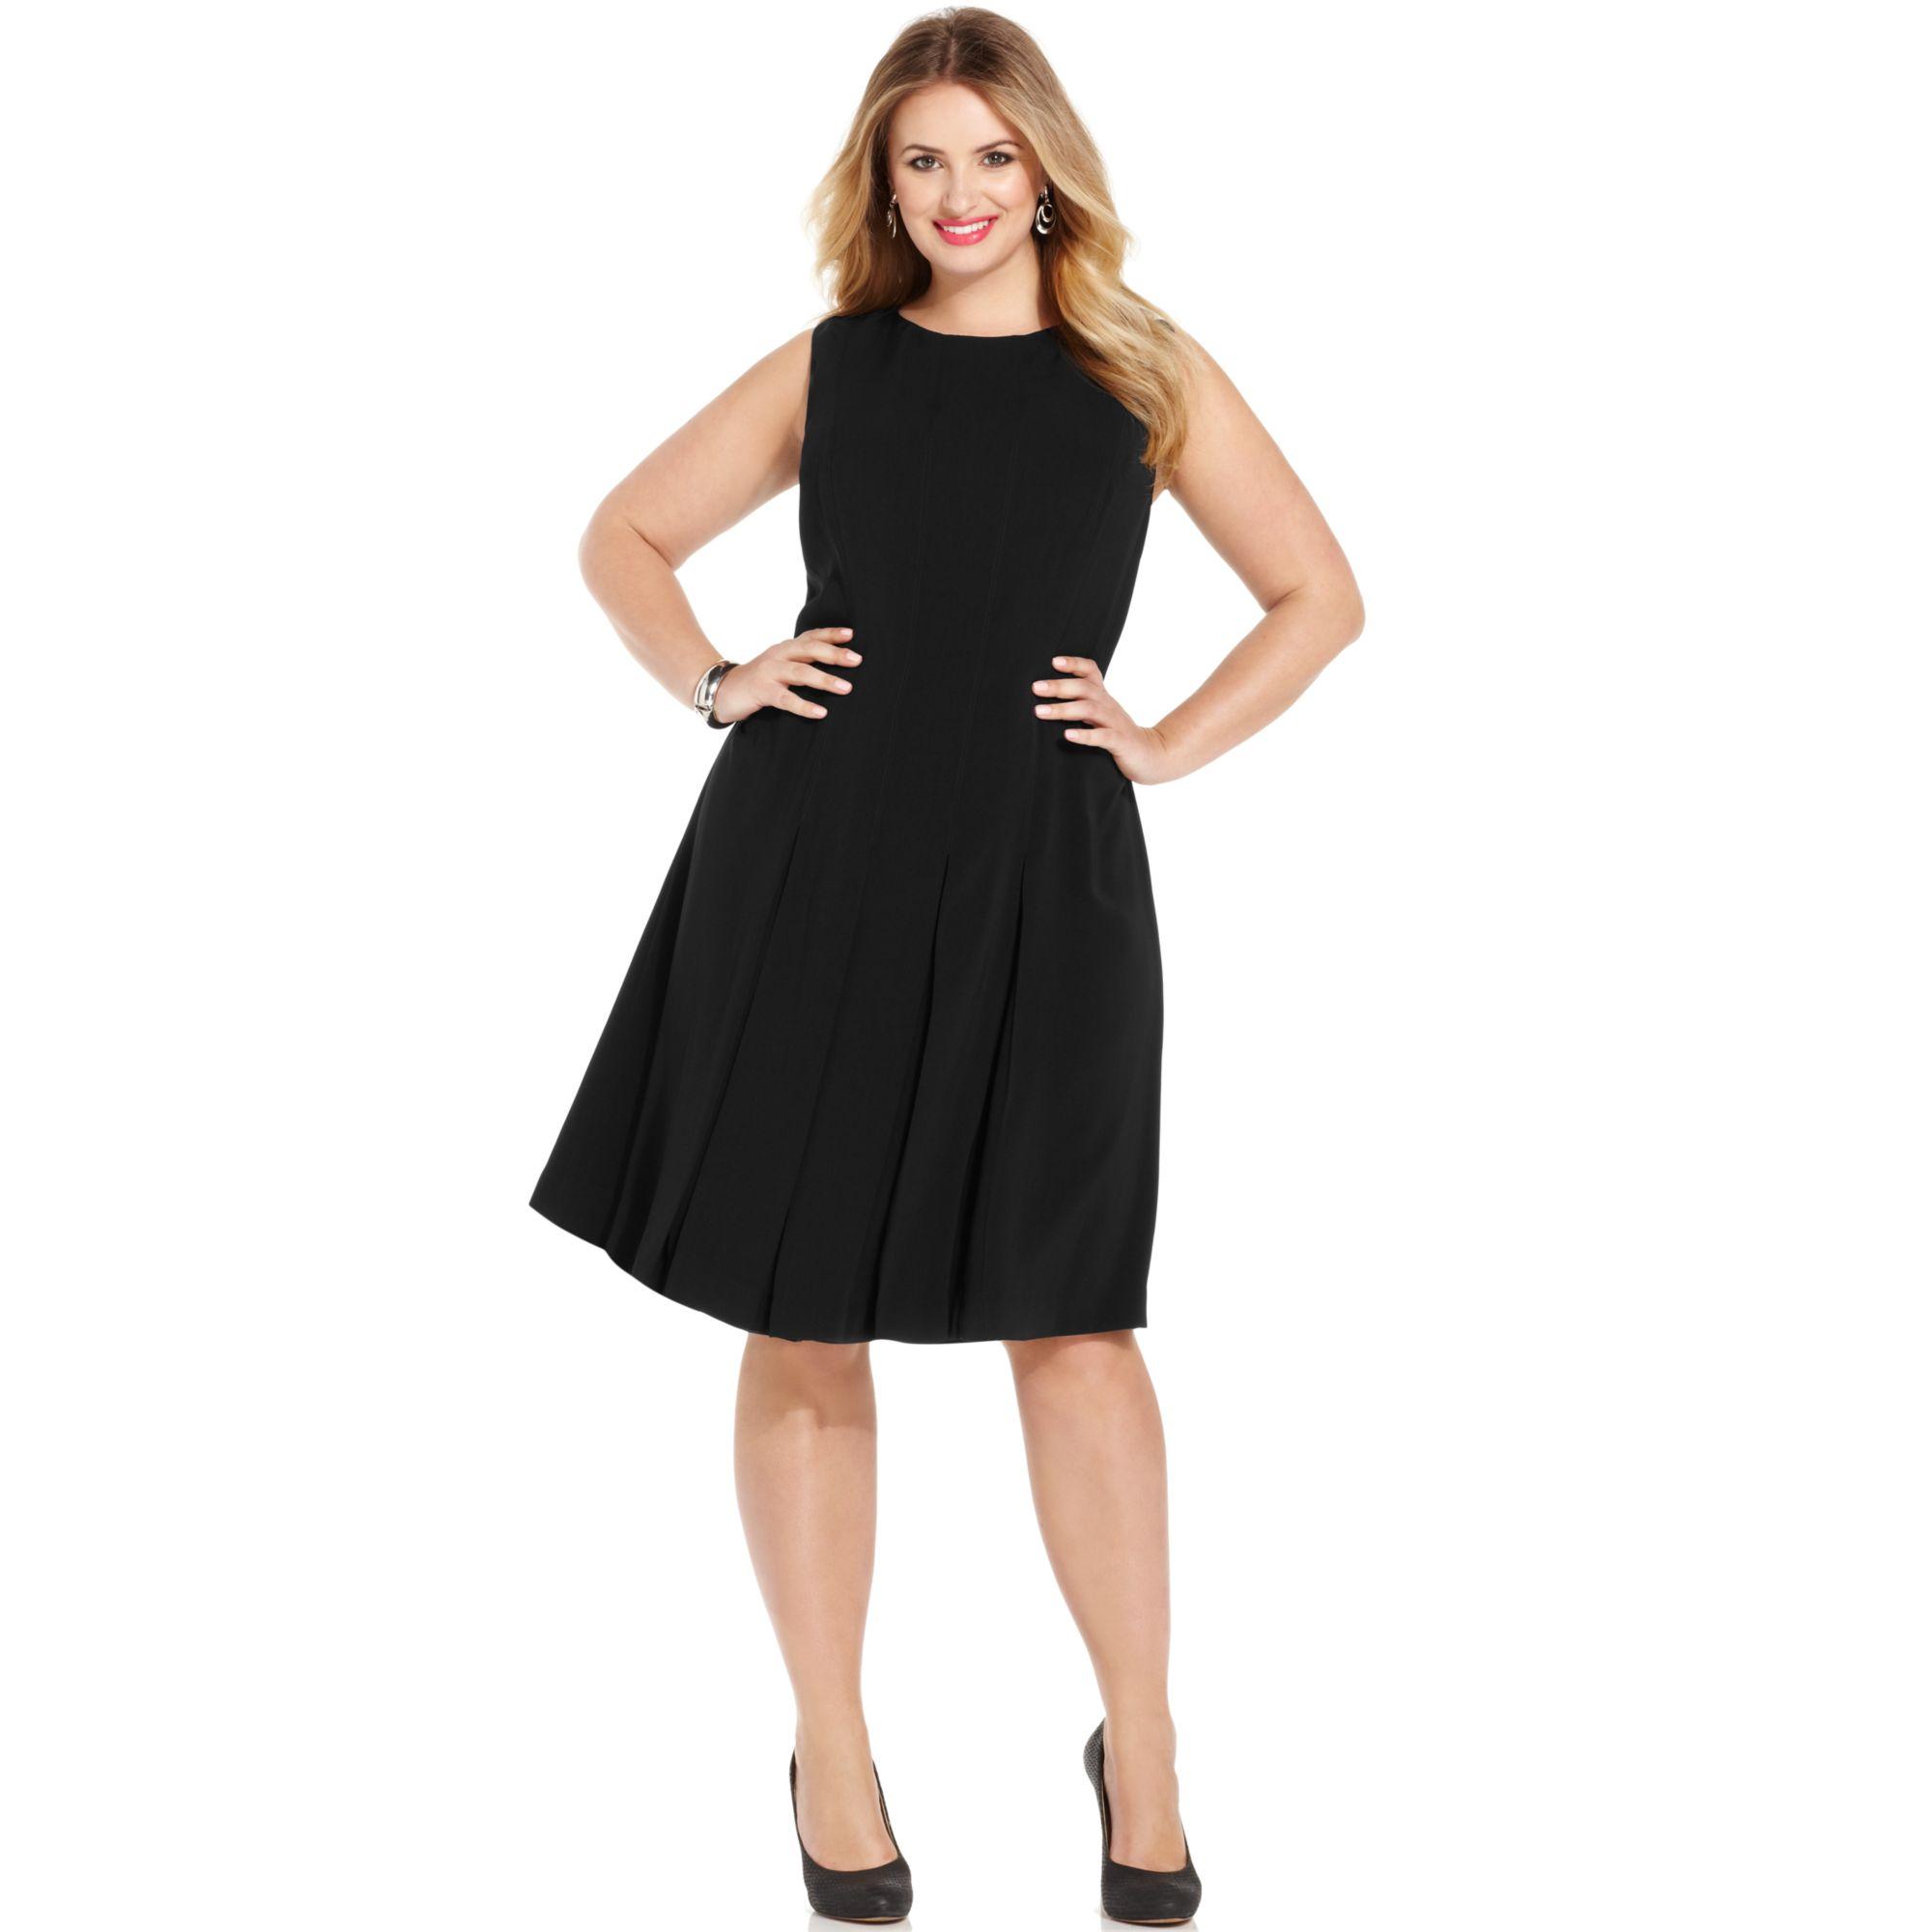 Jones Ny Dresses Plus Size - Dress Foto and Picture